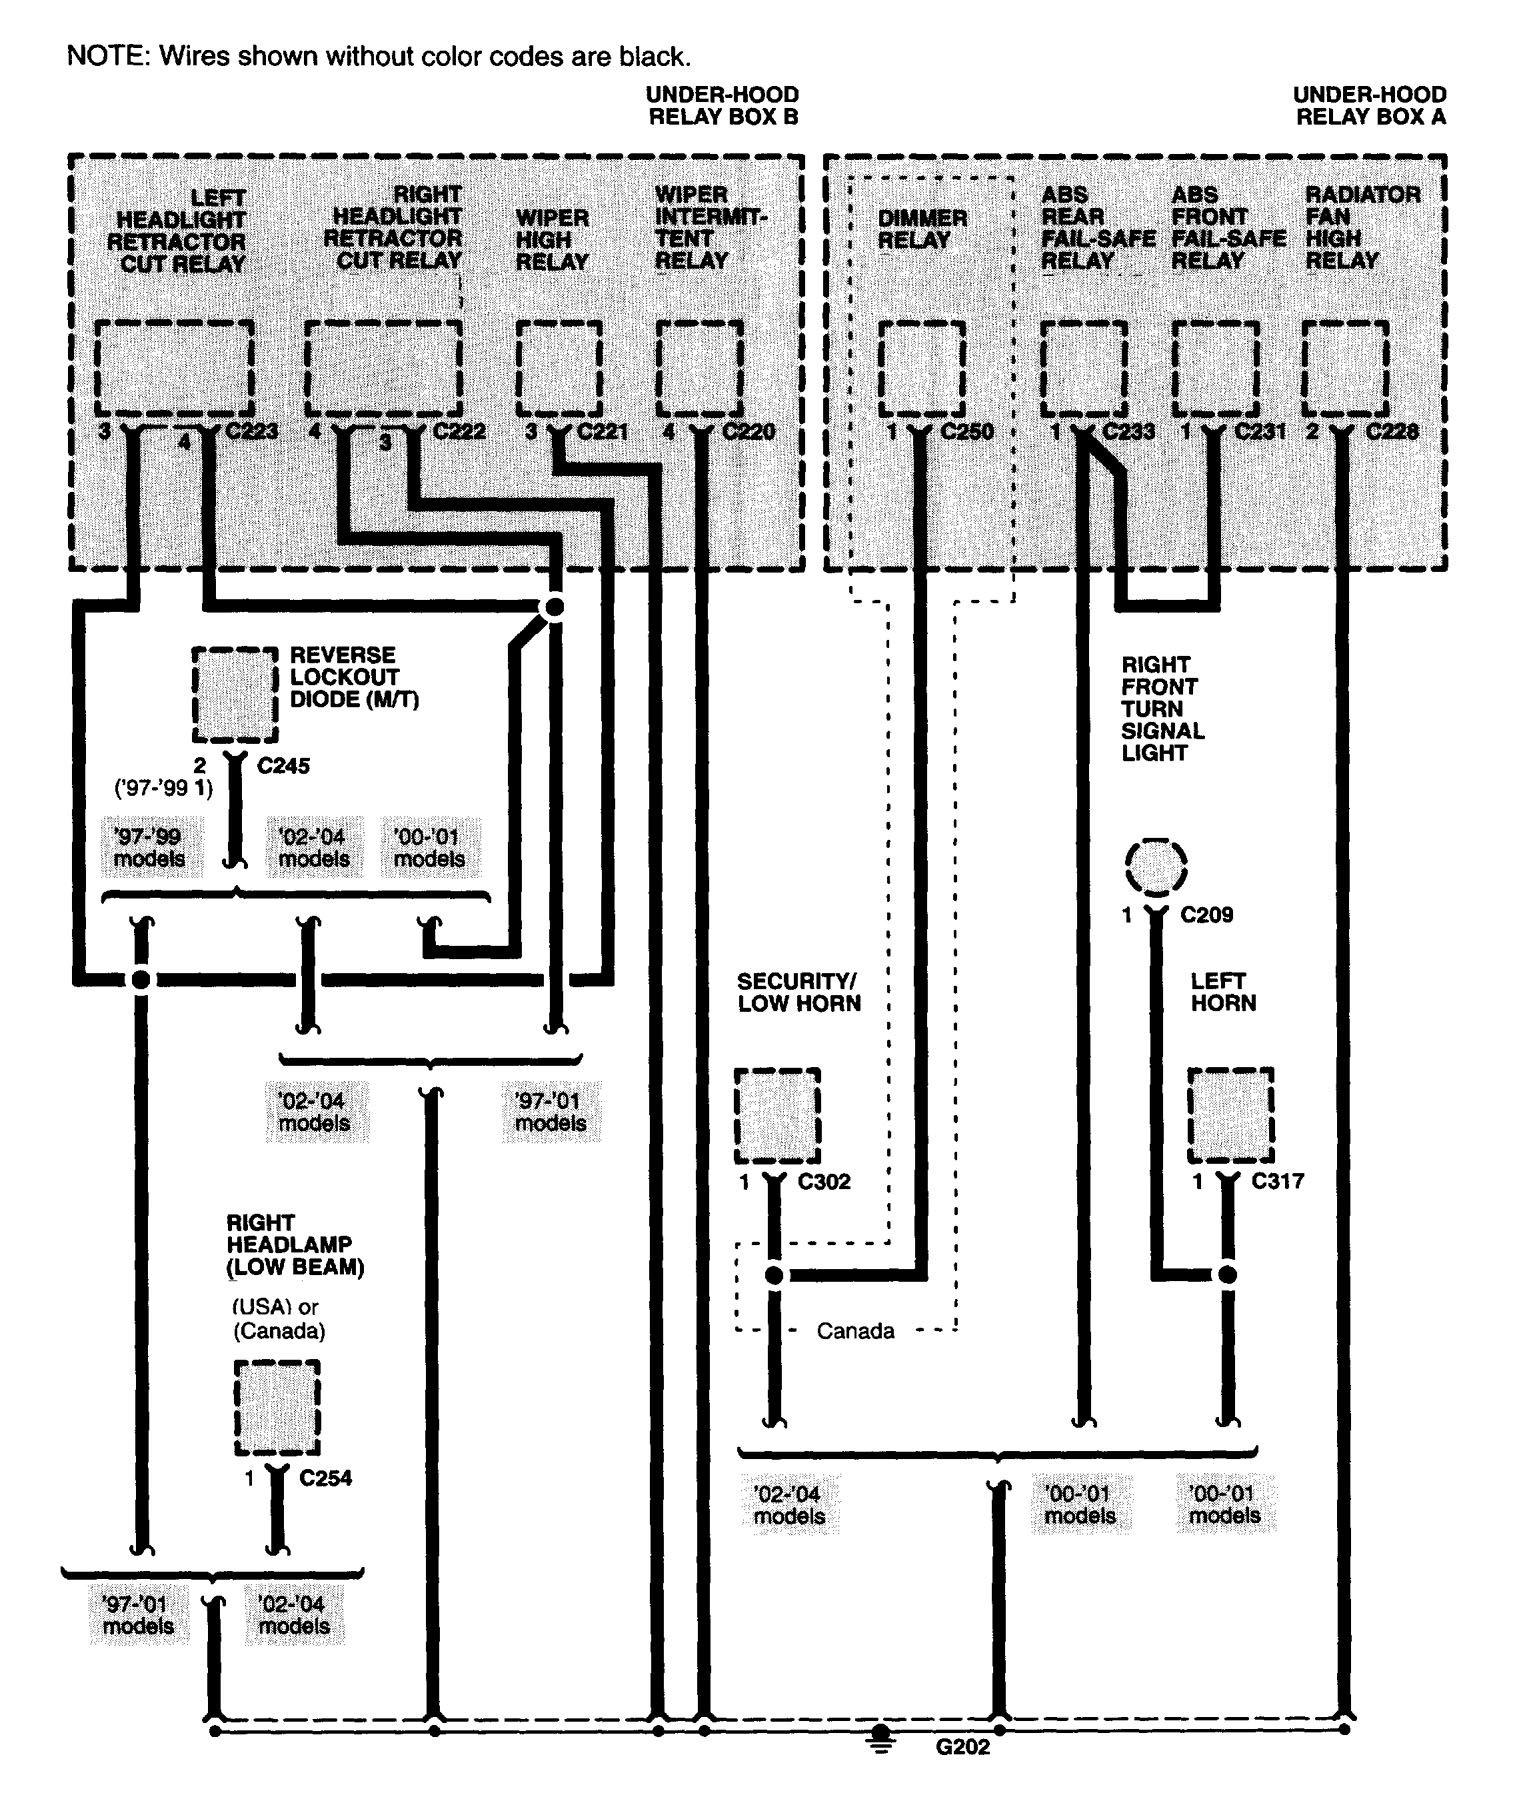 Acura Nsx 1997 2004 Wiring Diagrams Grand Distribution Diagram